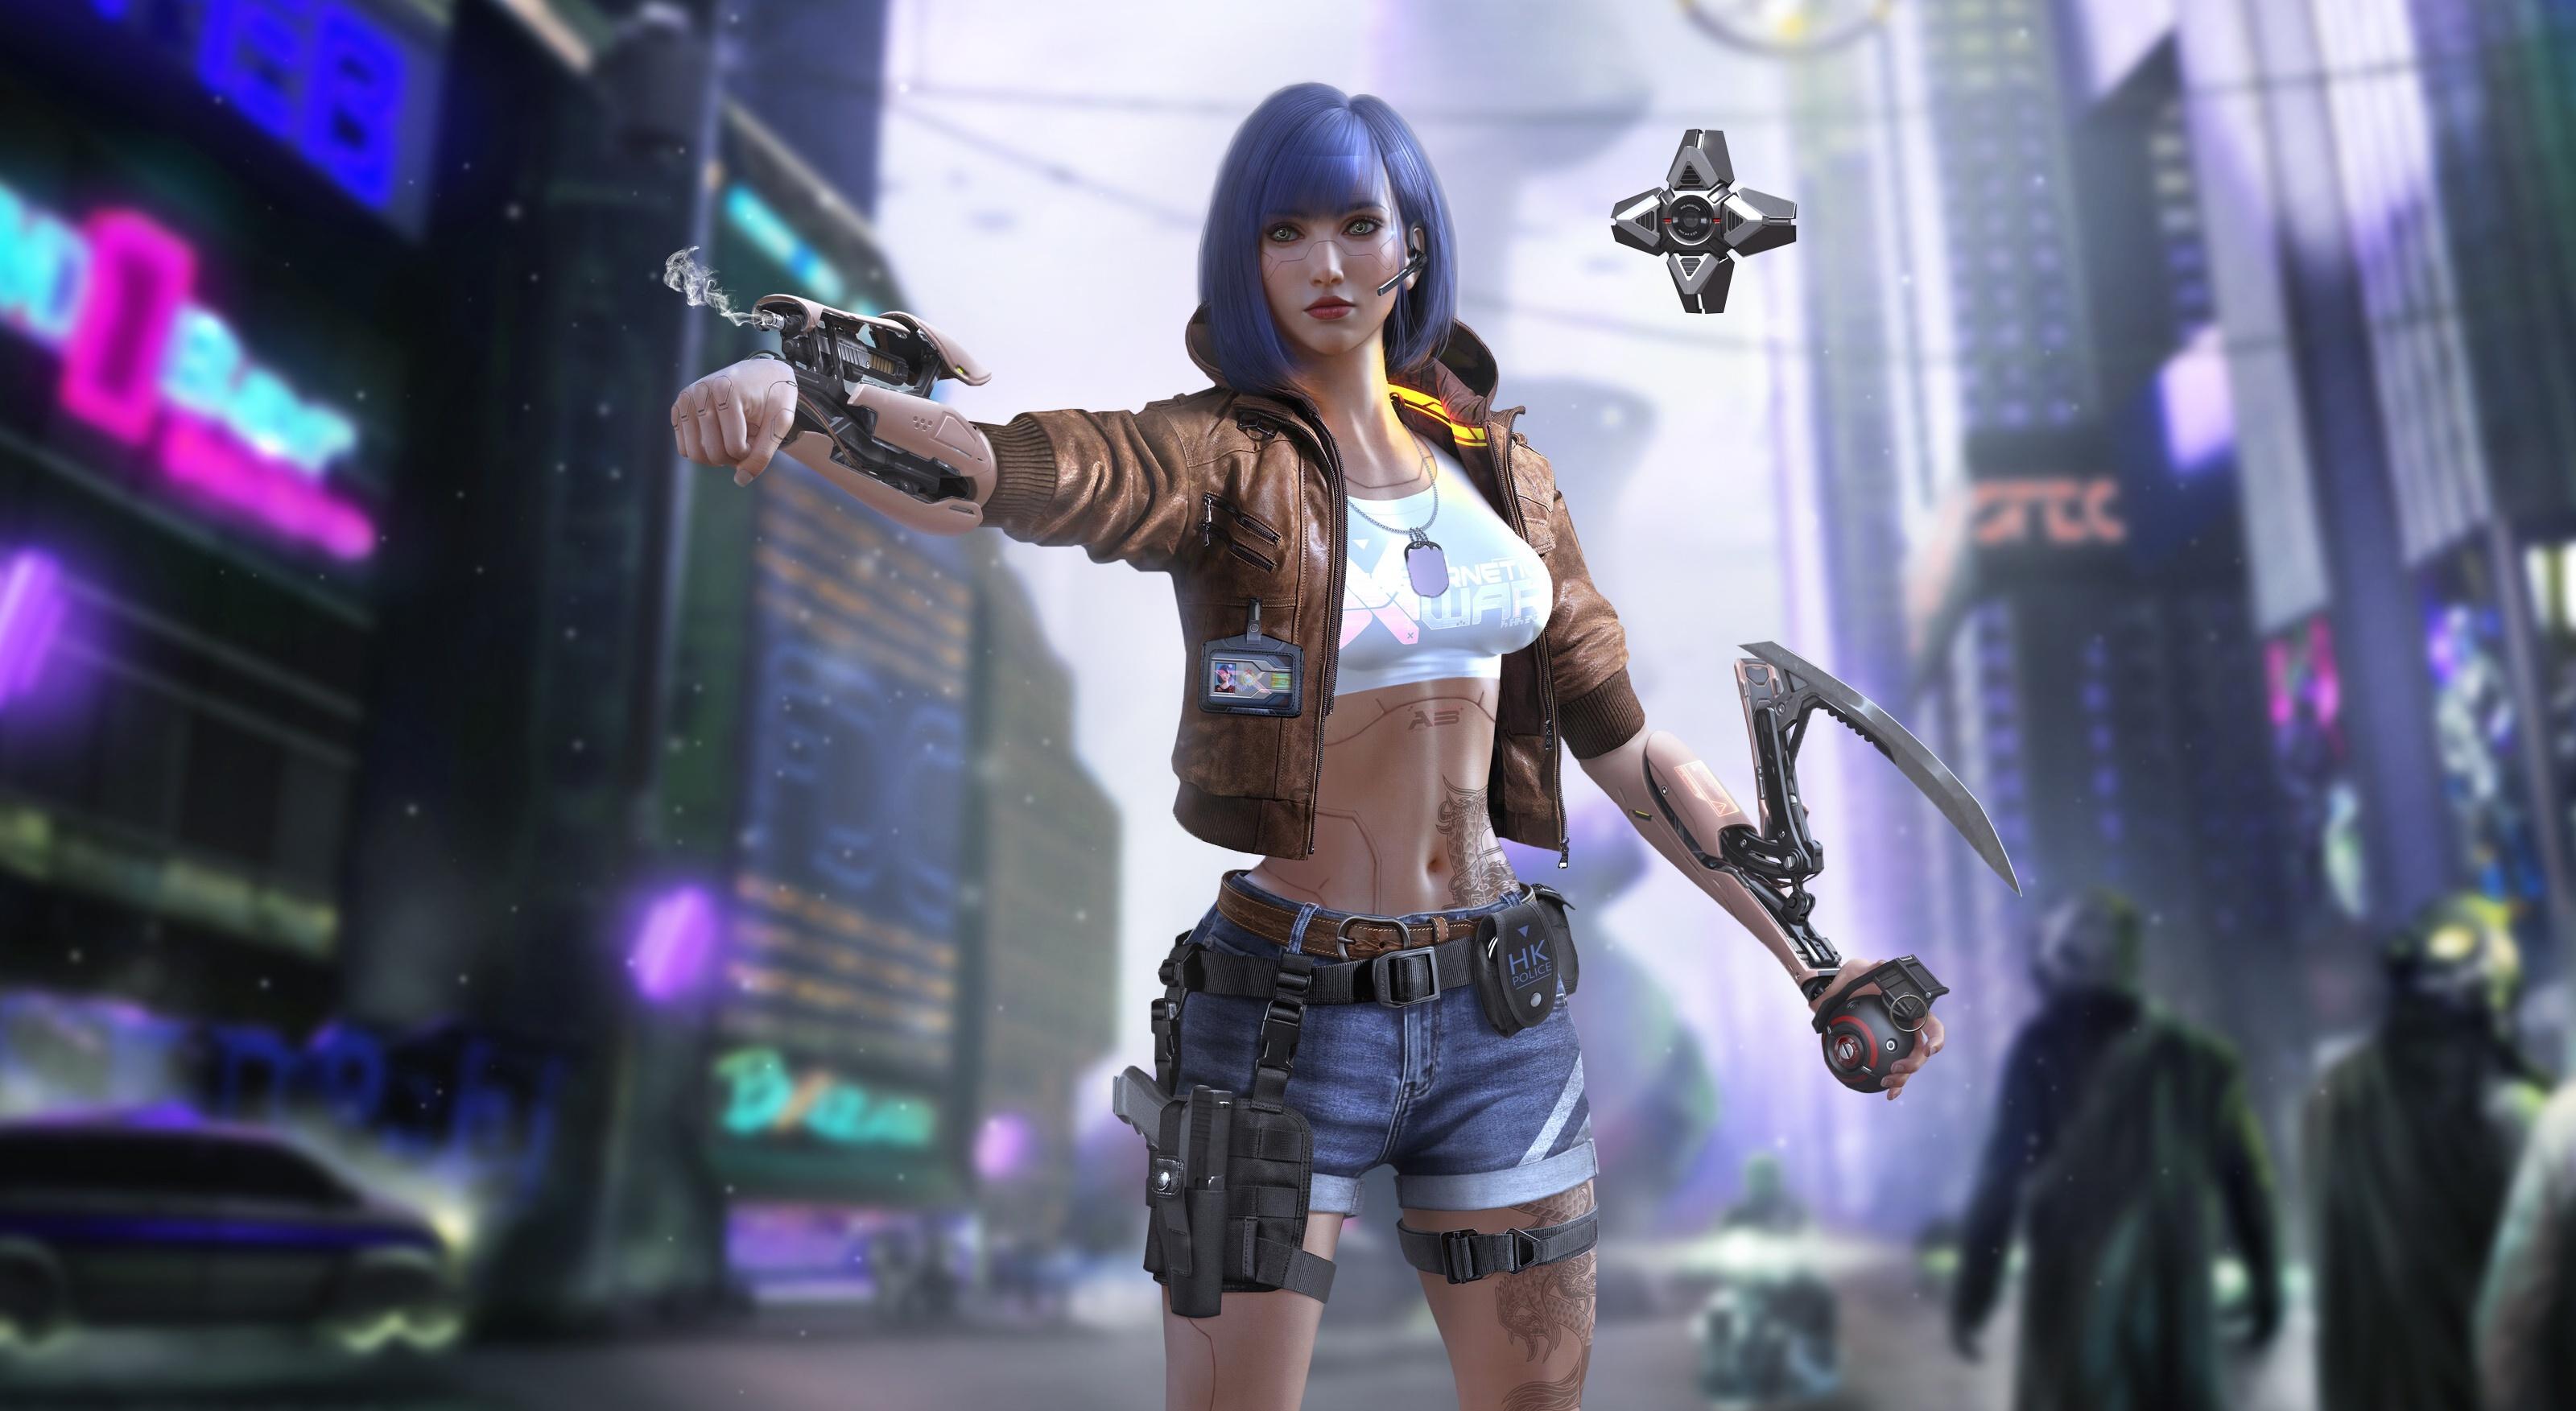 سی دی کی اریجینال GOG بازی Cyberpunk 2077